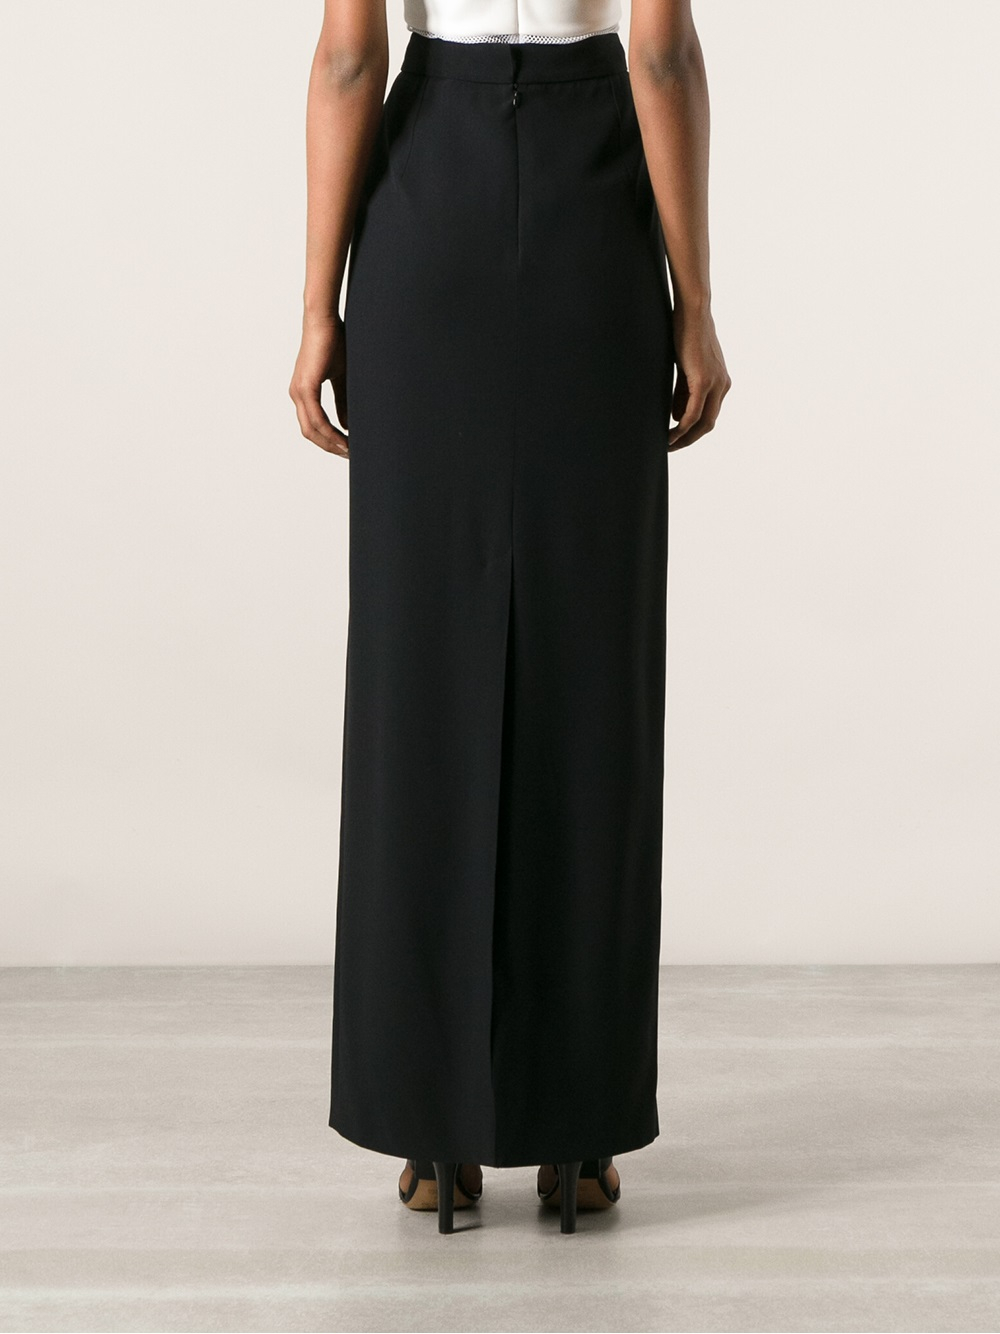 Alexander mcqueen Maxi Pencil Skirt in Black | Lyst